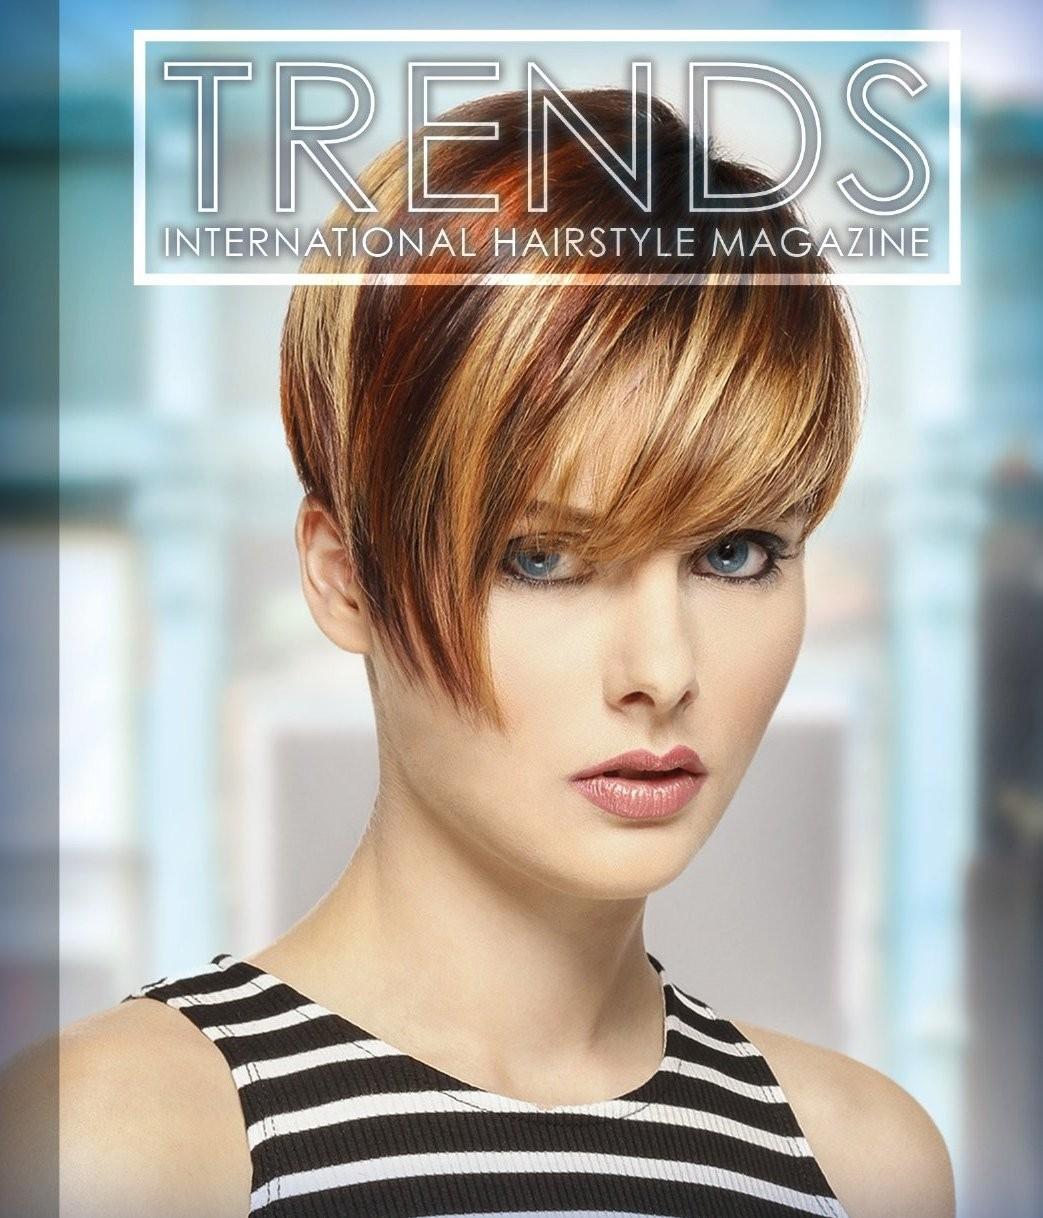 B&G Trends Magazin No. 17